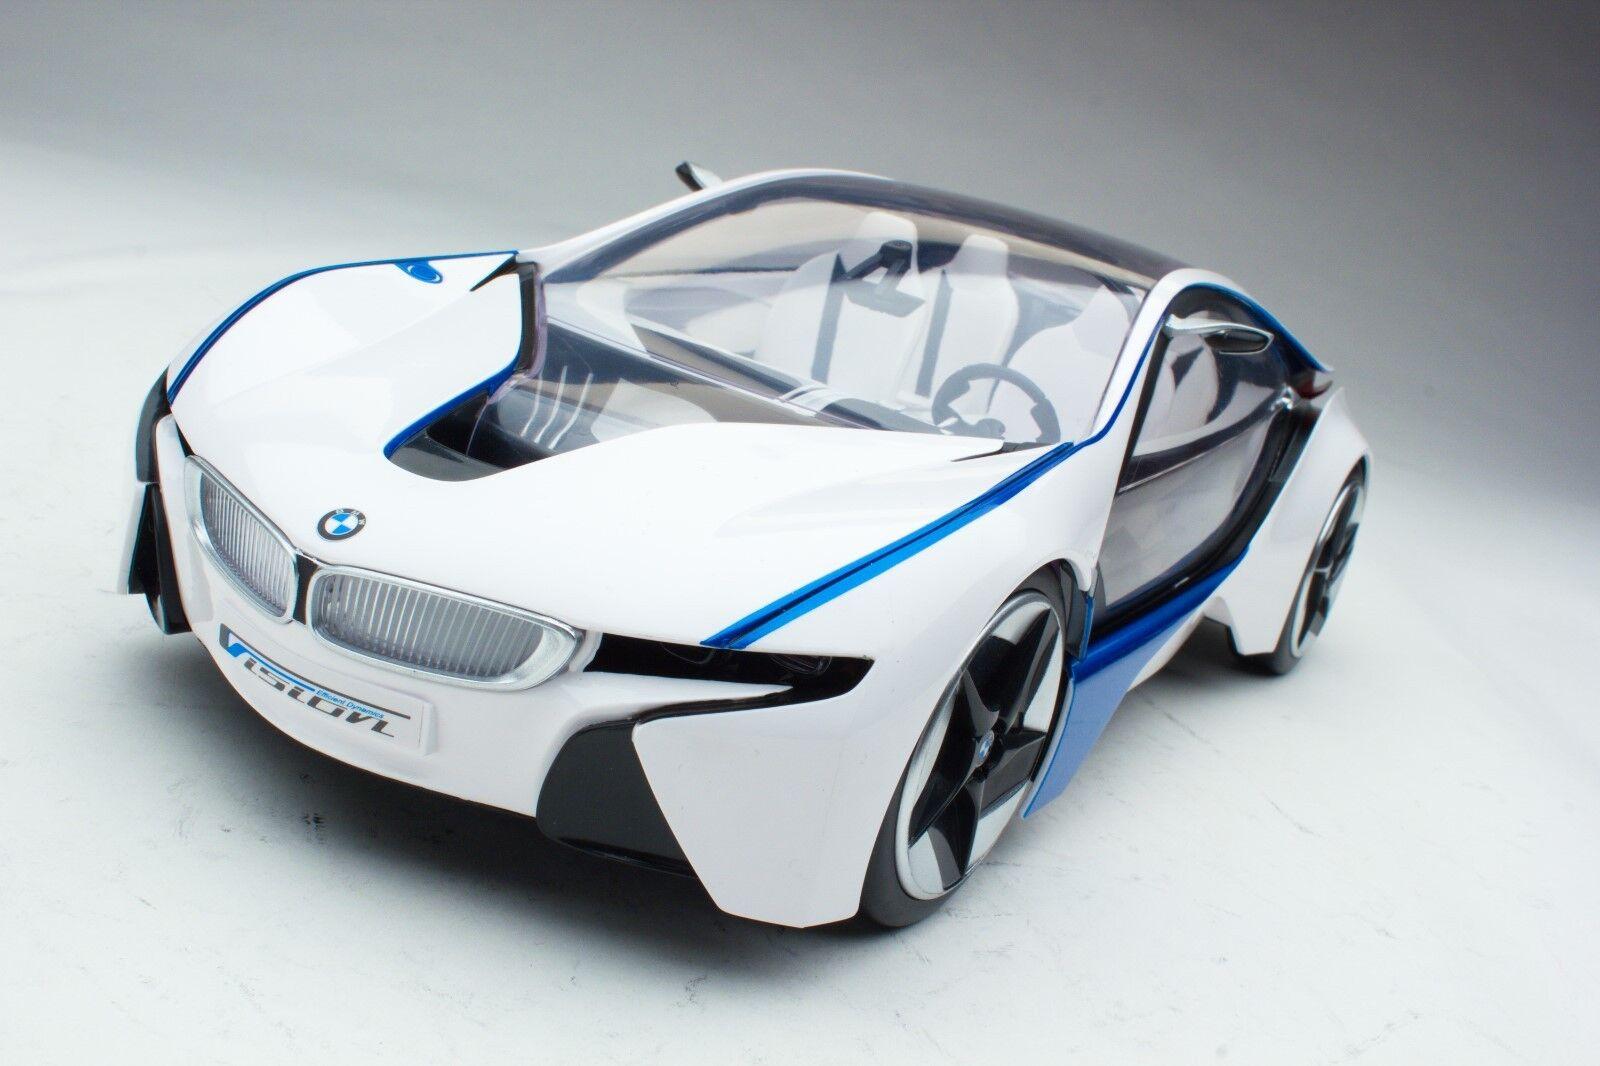 BMW I8 Concepto   Ved   Calidad R C Model Coche   Big Escala 1 14   Producto